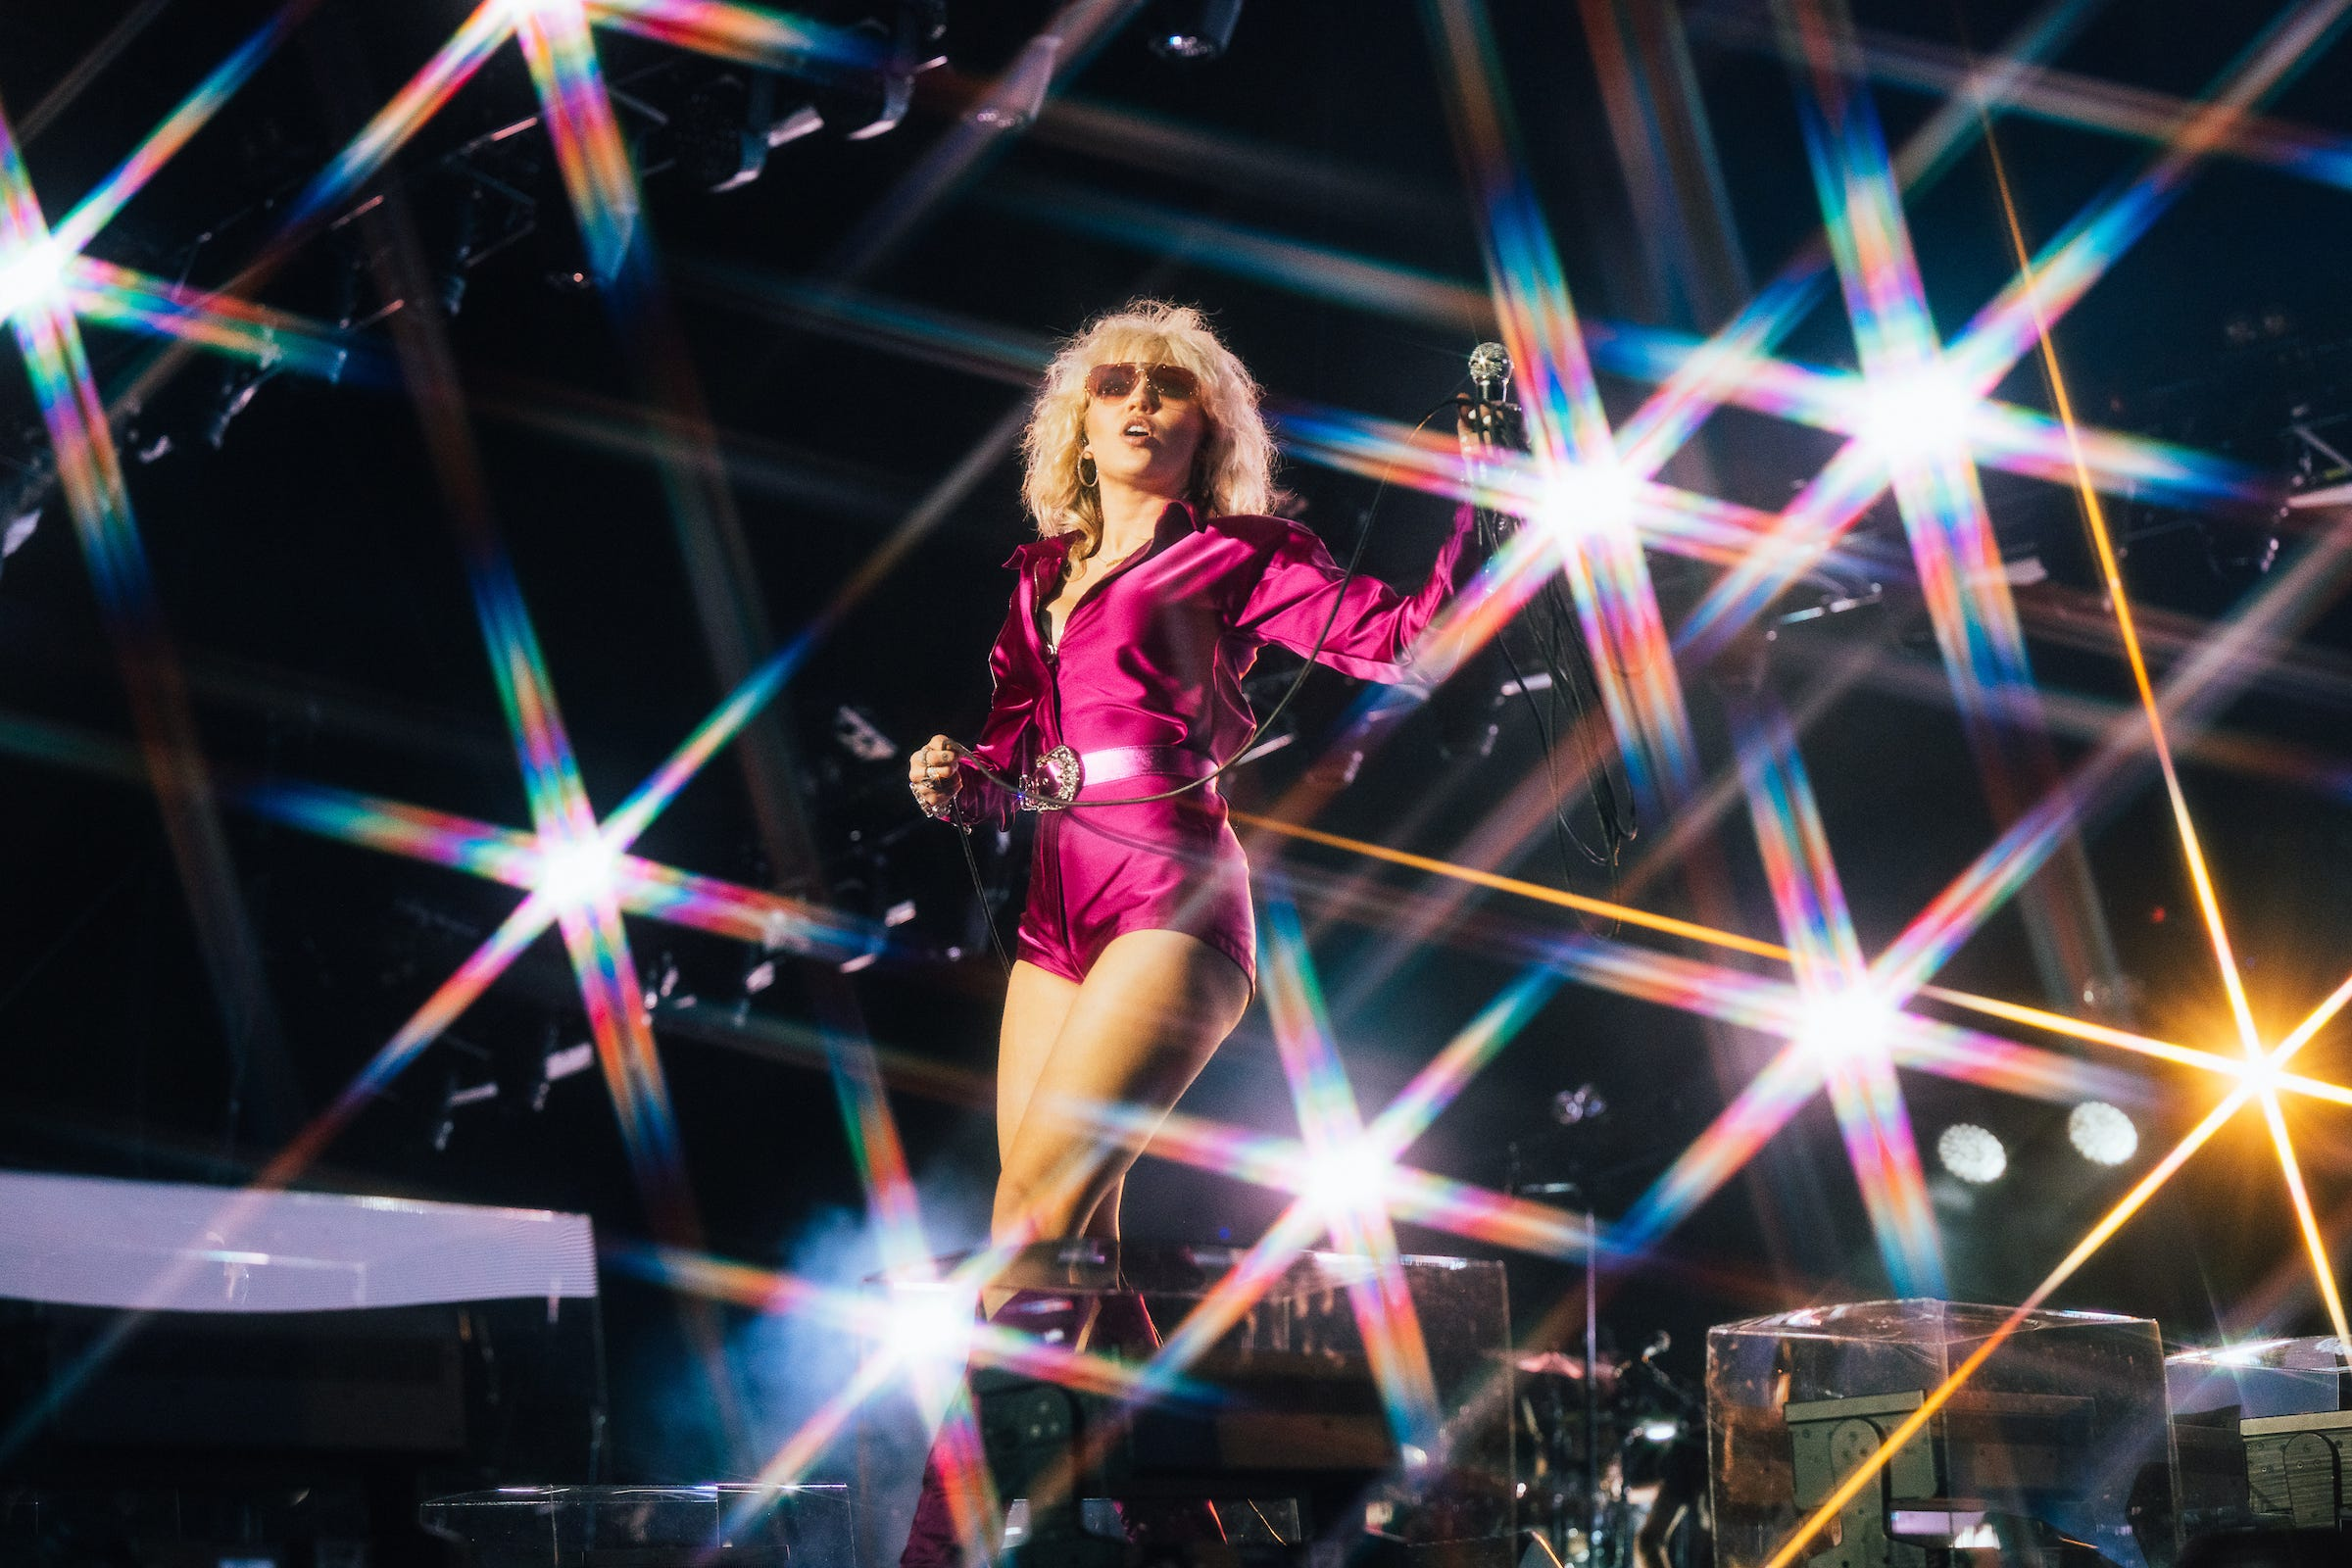 Miley Cyrus, rock goddess, communes with Janis Joplin s spirit in Austin City Limits debut